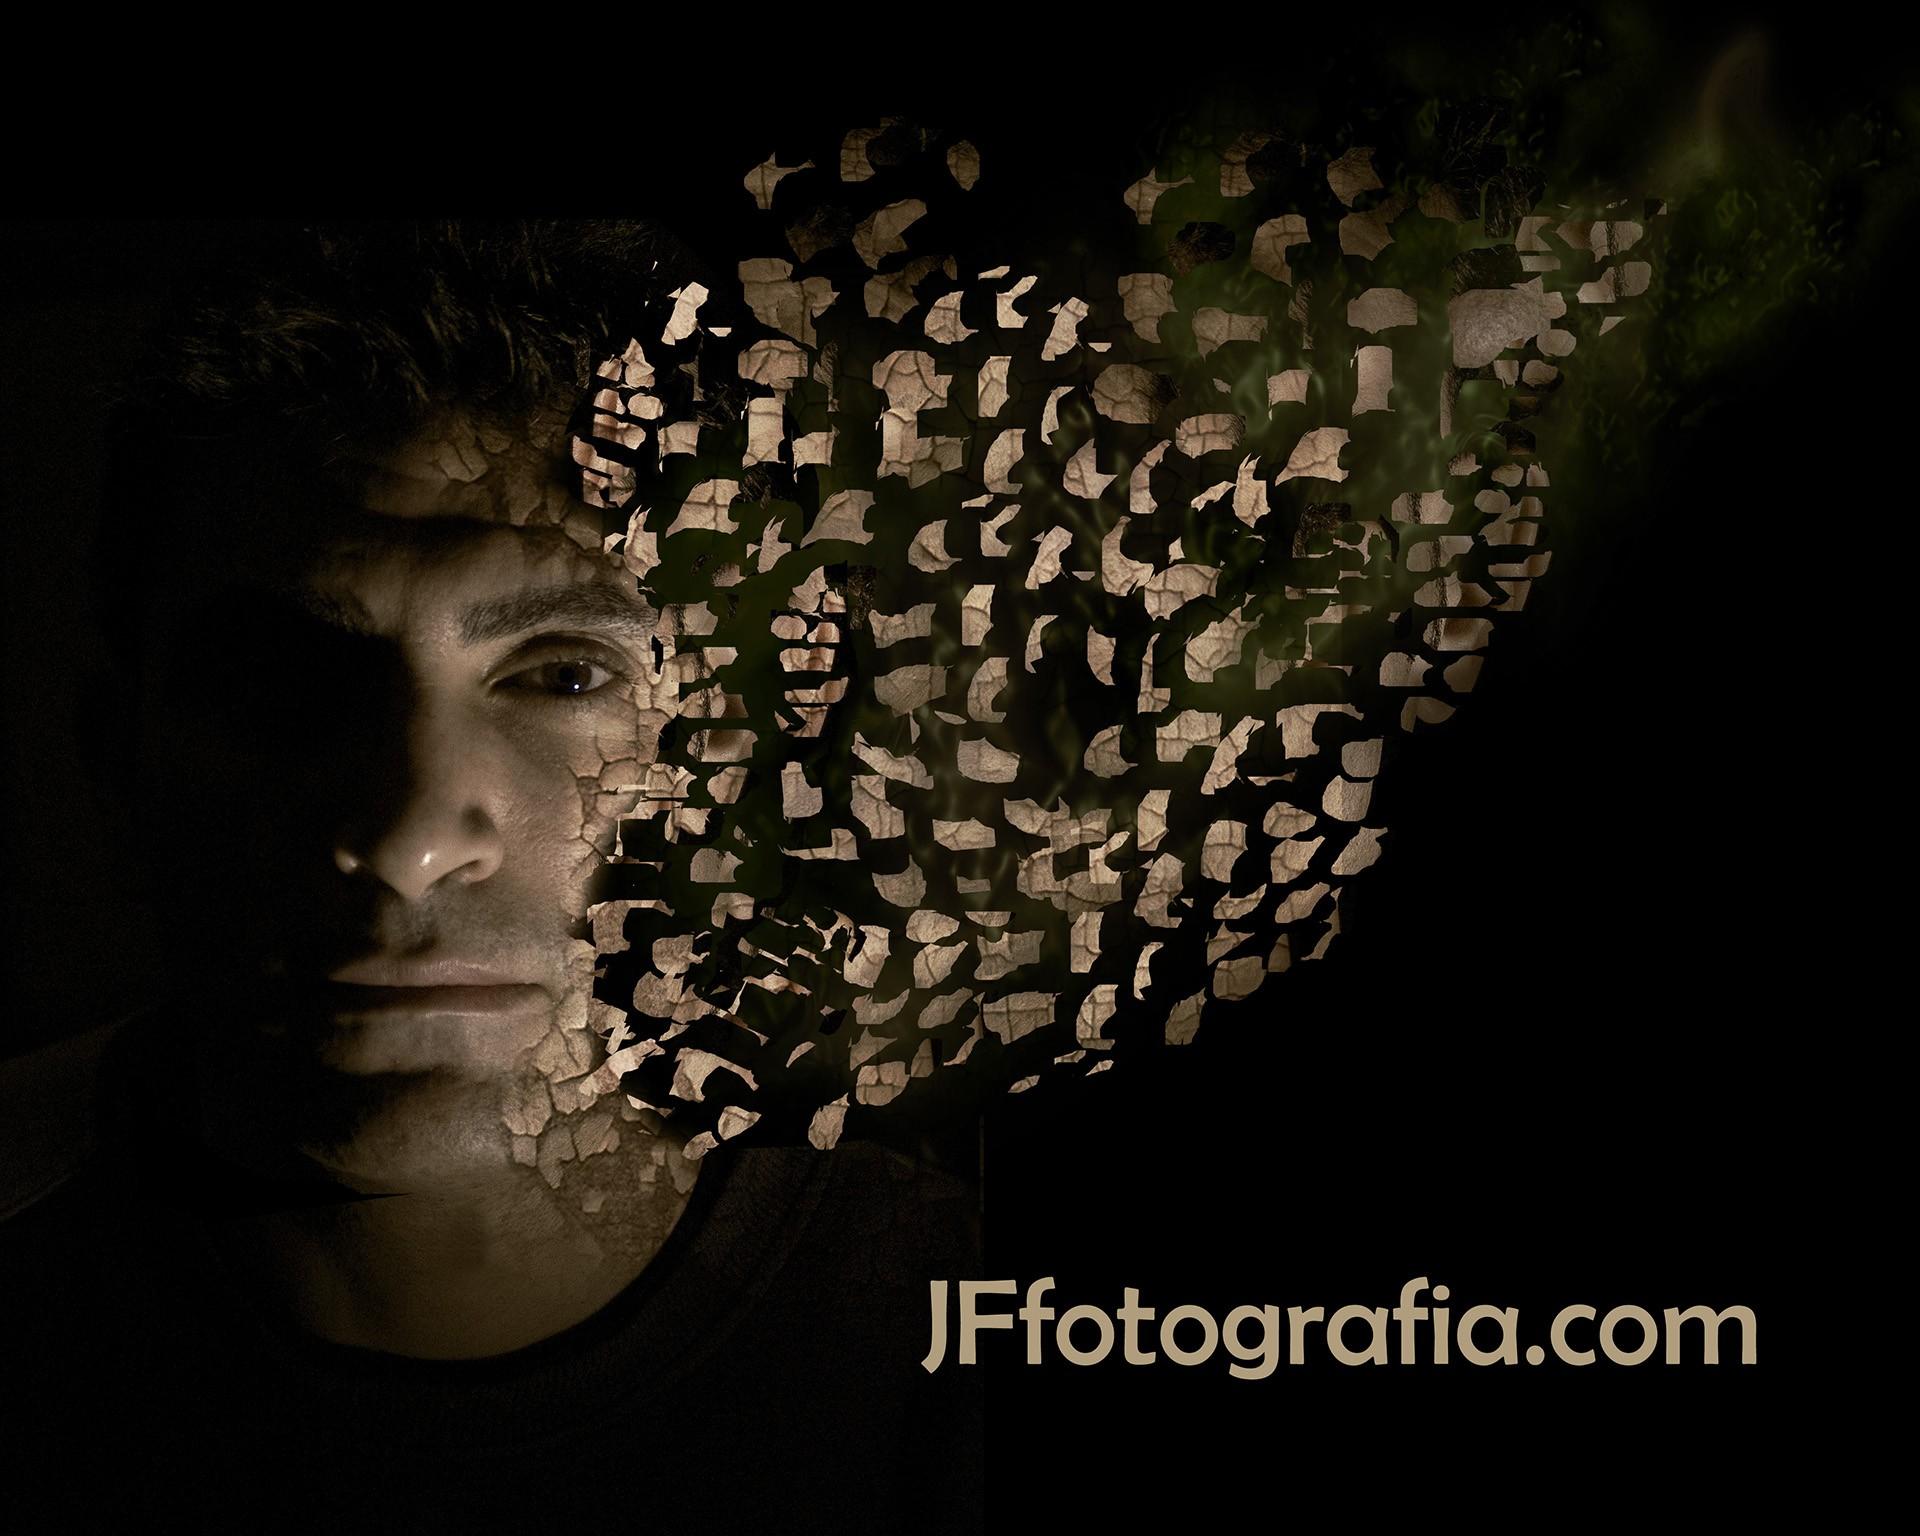 Web JFfotografia